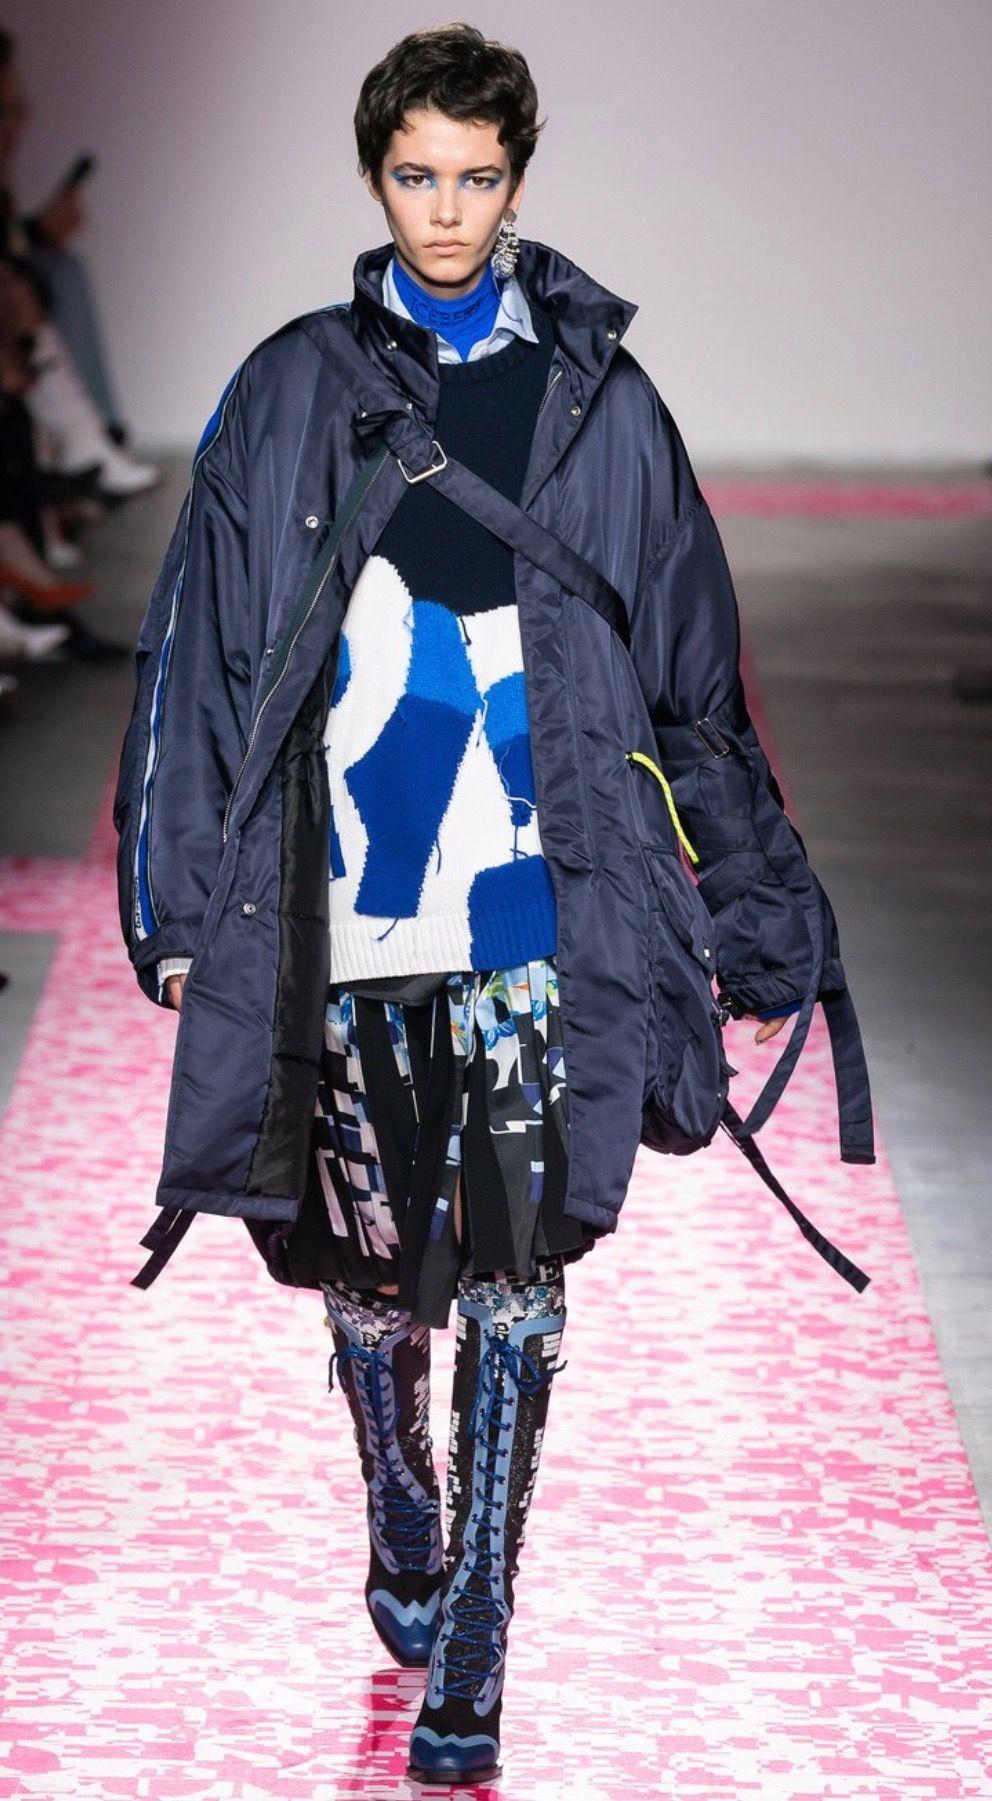 Iceberg Fall 2019 Rtw Chic Outerwear Fashion Rain Jacket [ 1801 x 992 Pixel ]